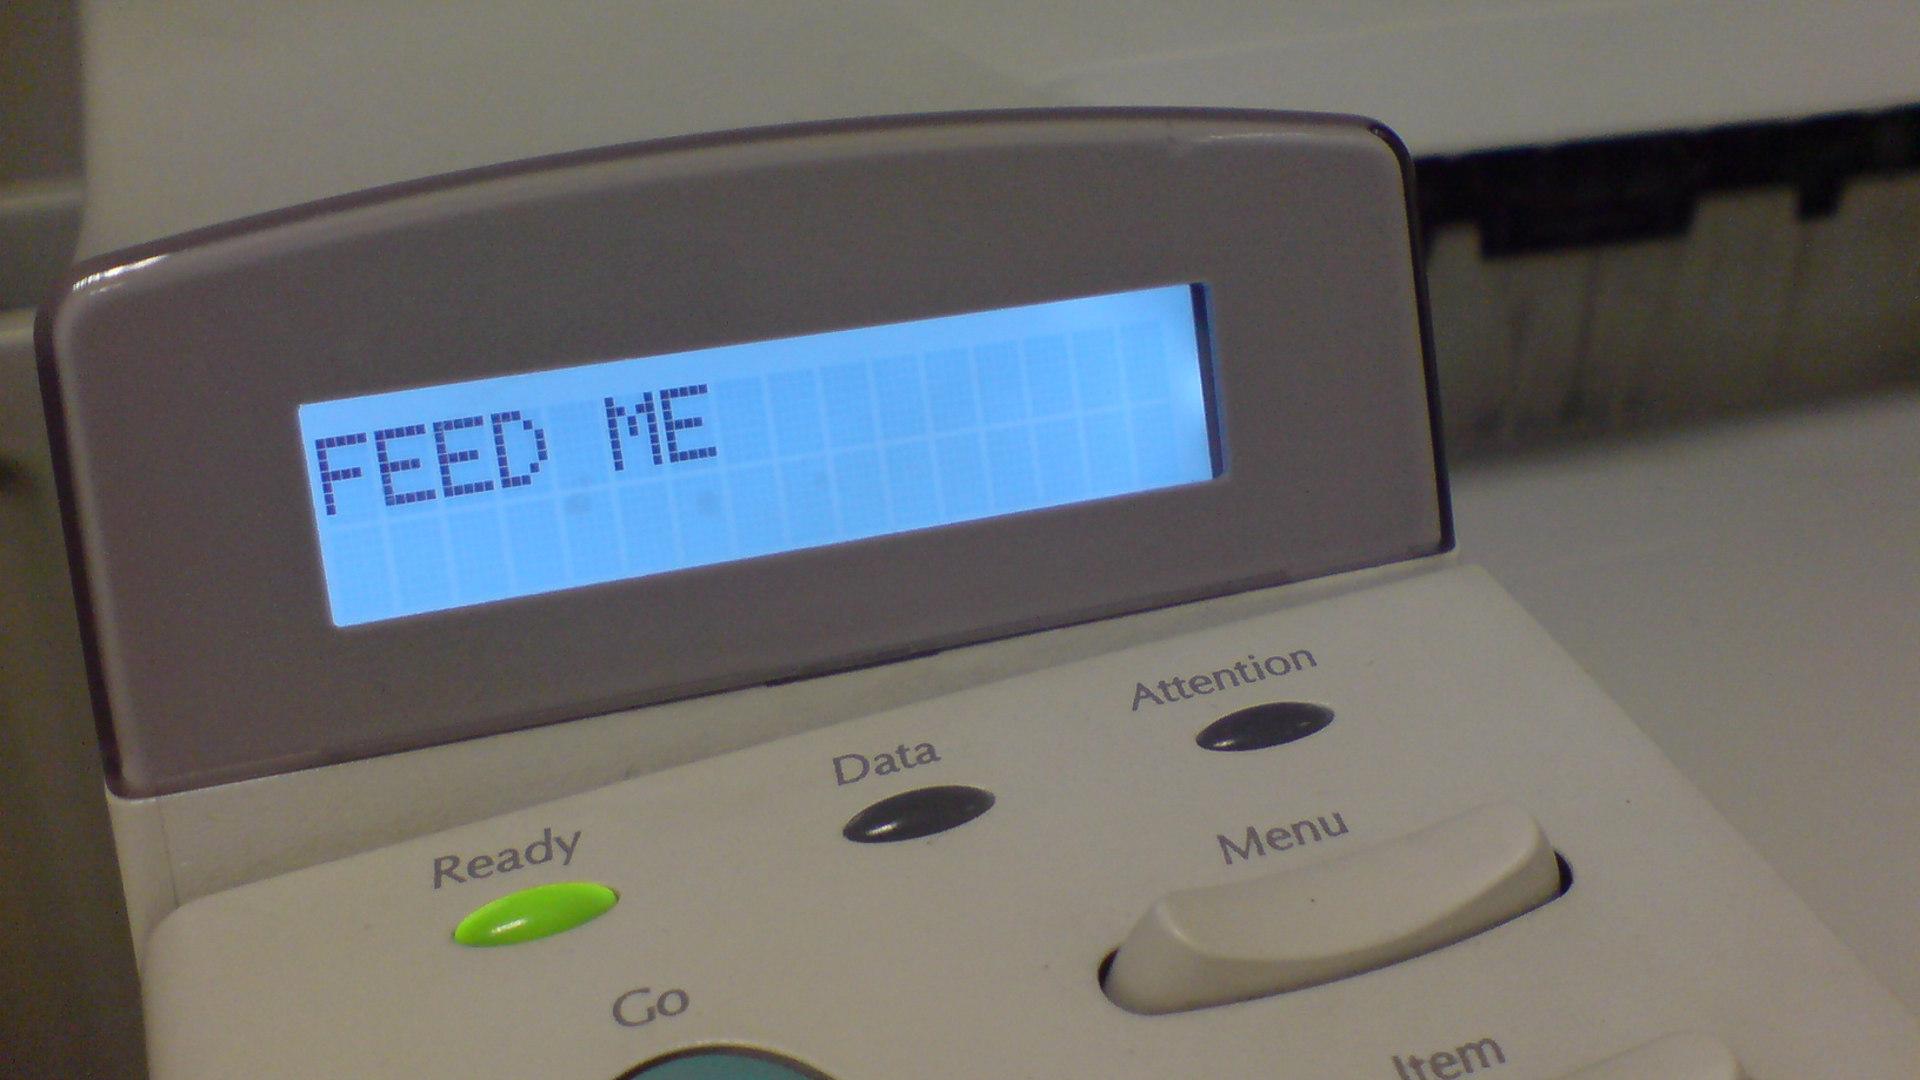 Printers gone wild!